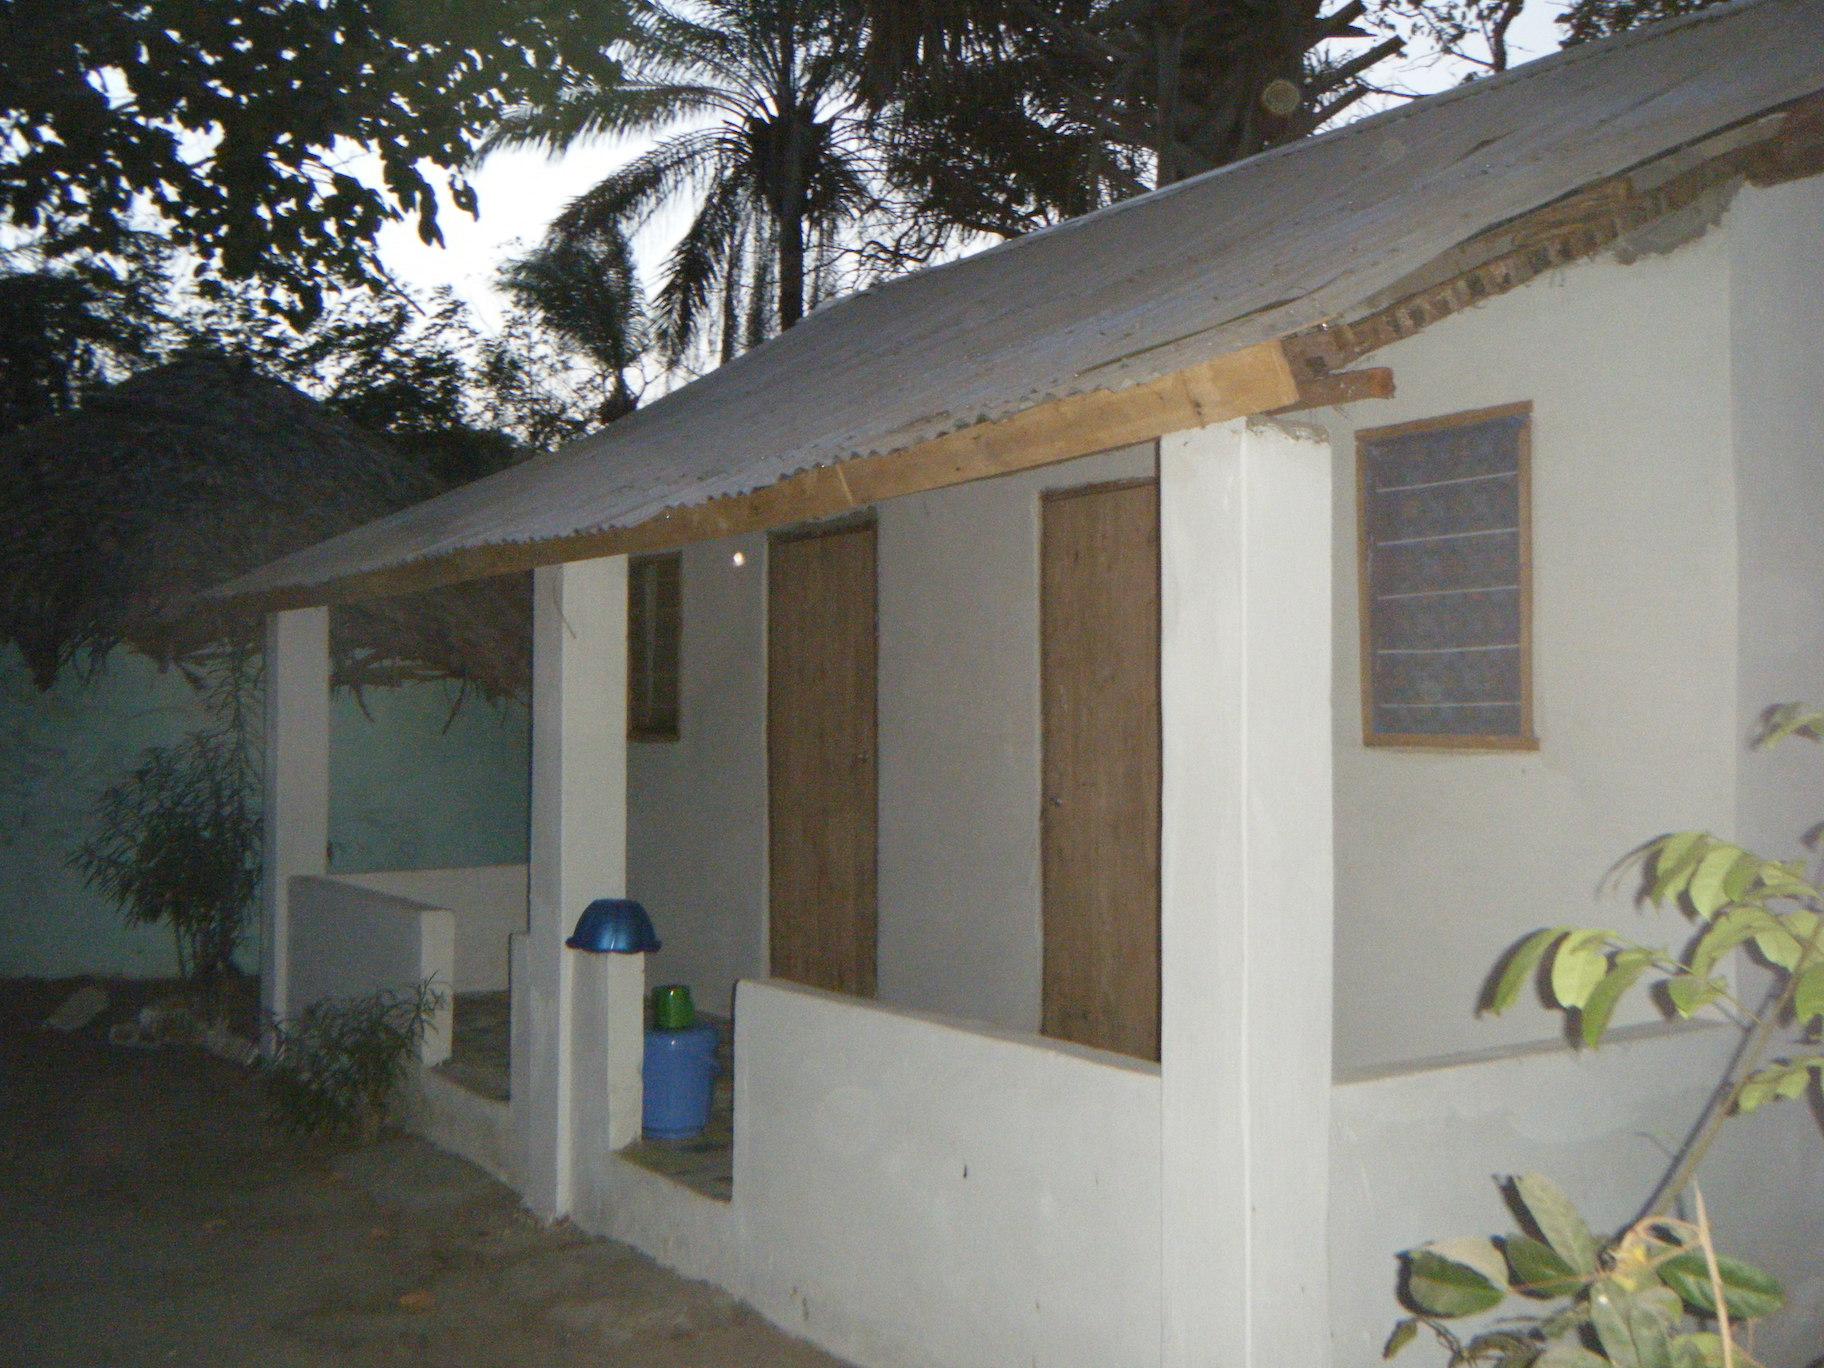 More block accommodation